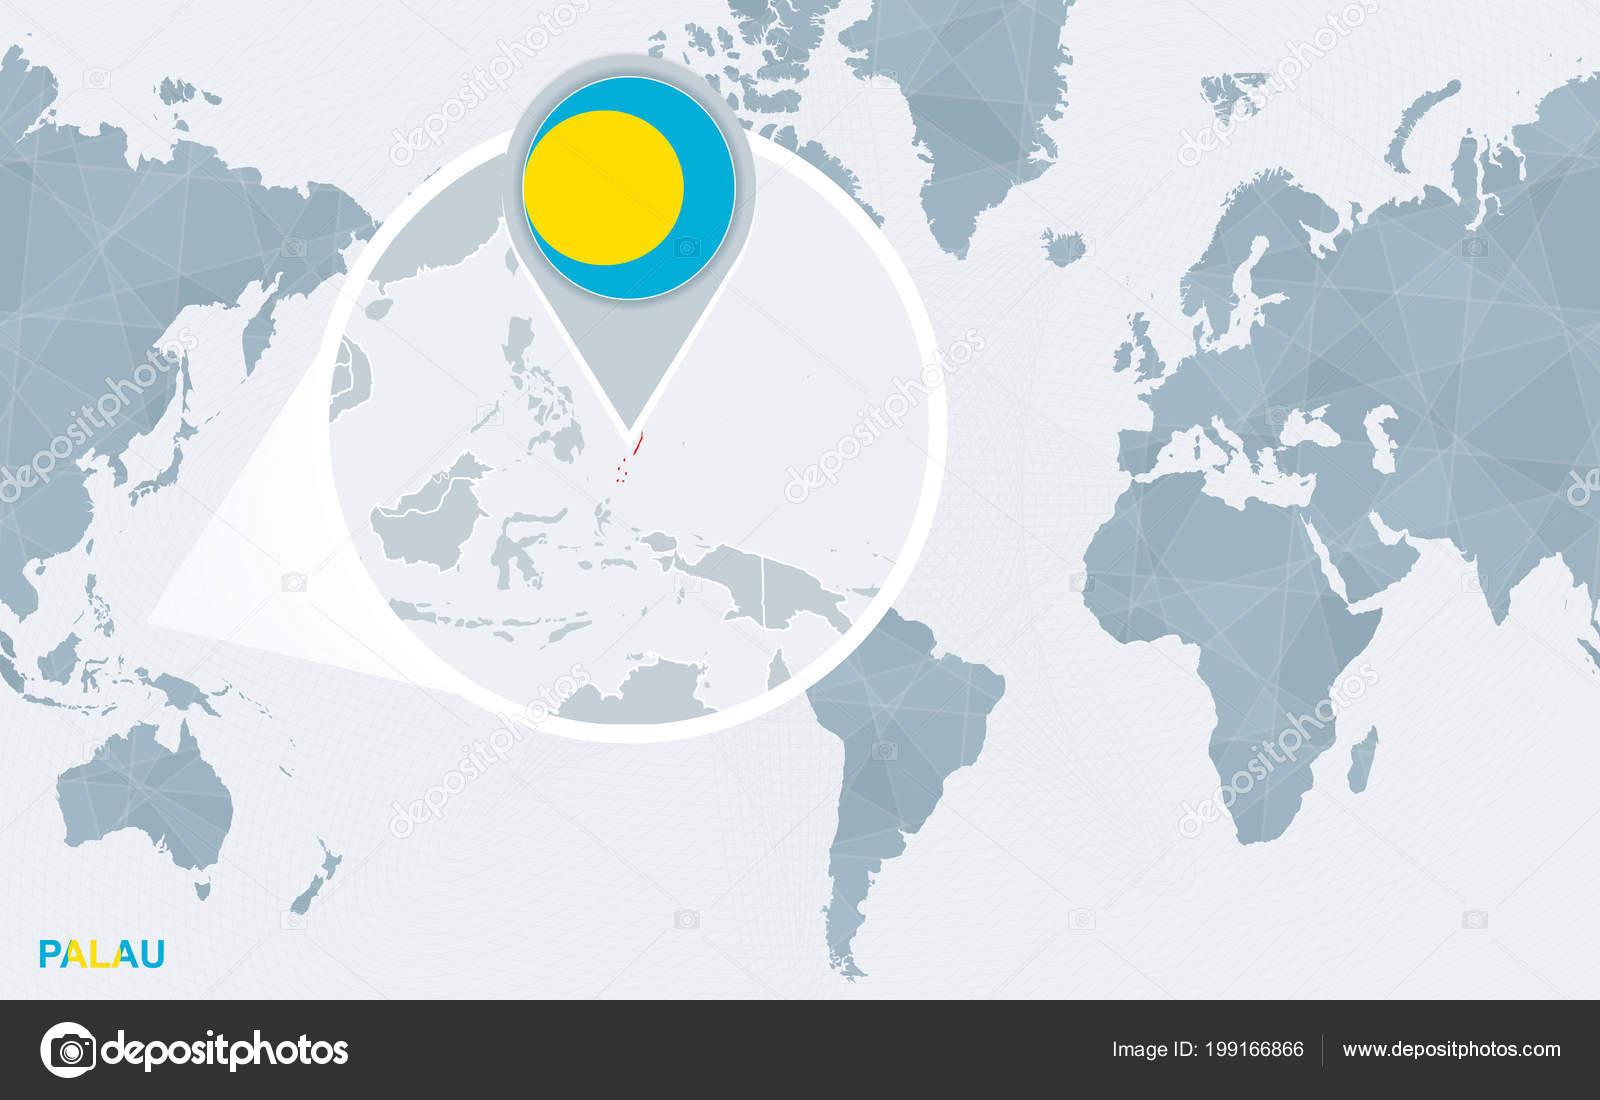 World map centered america magnified palau blue flag map palau world map centered america magnified palau blue flag map palau vector de stock gumiabroncs Choice Image